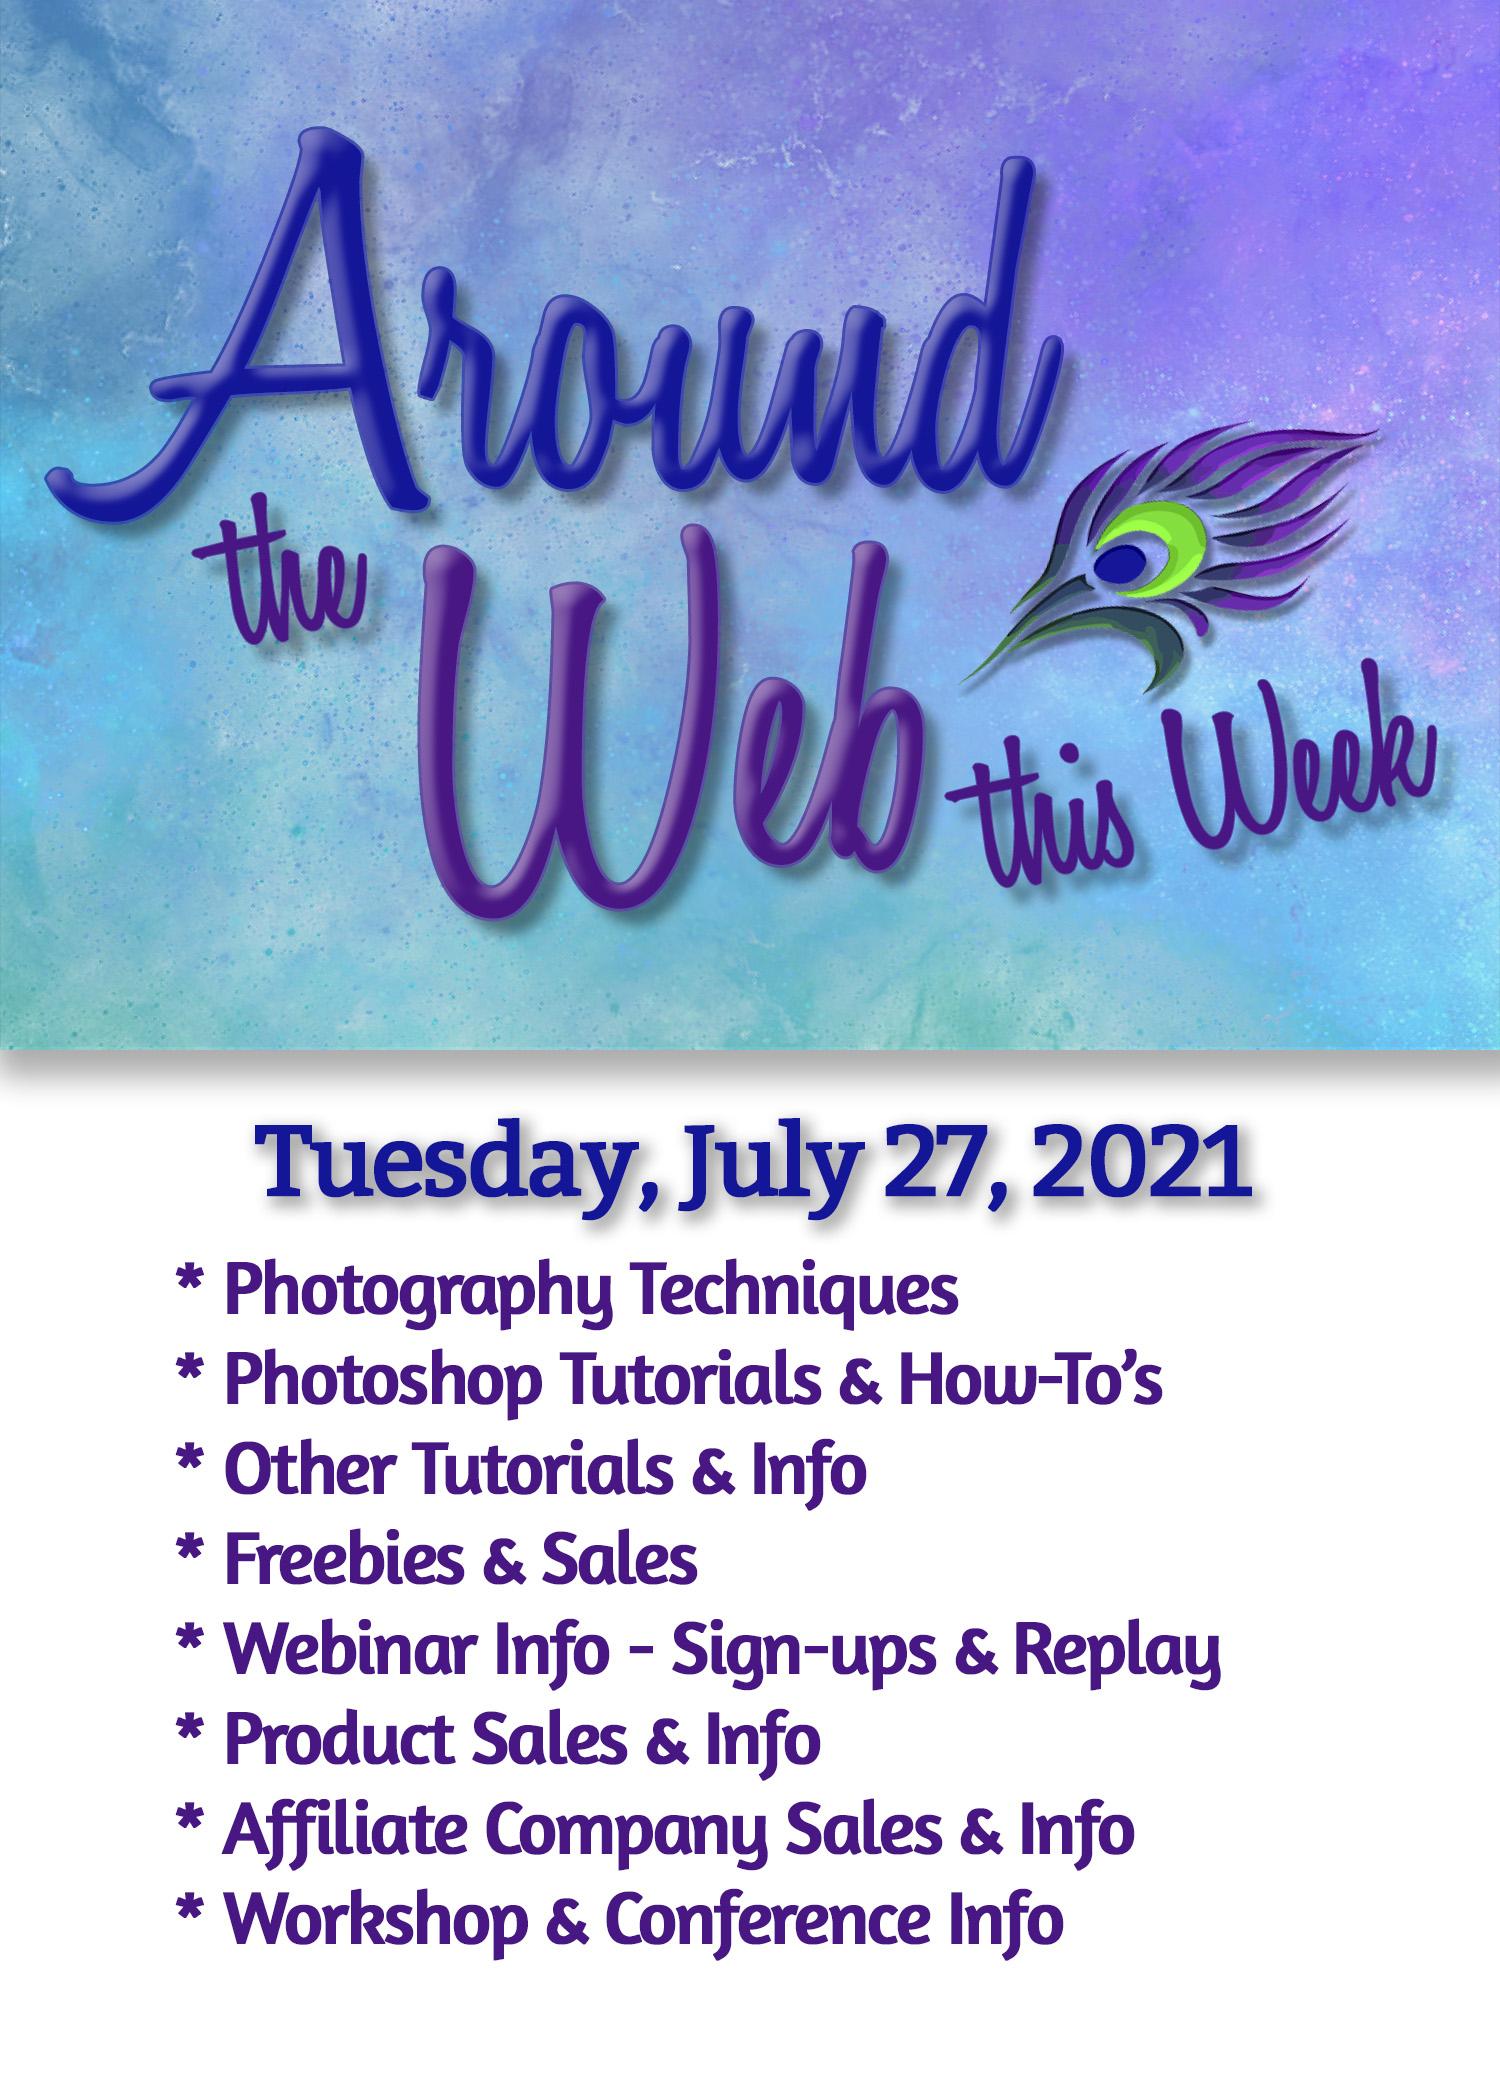 Around the Web July 27